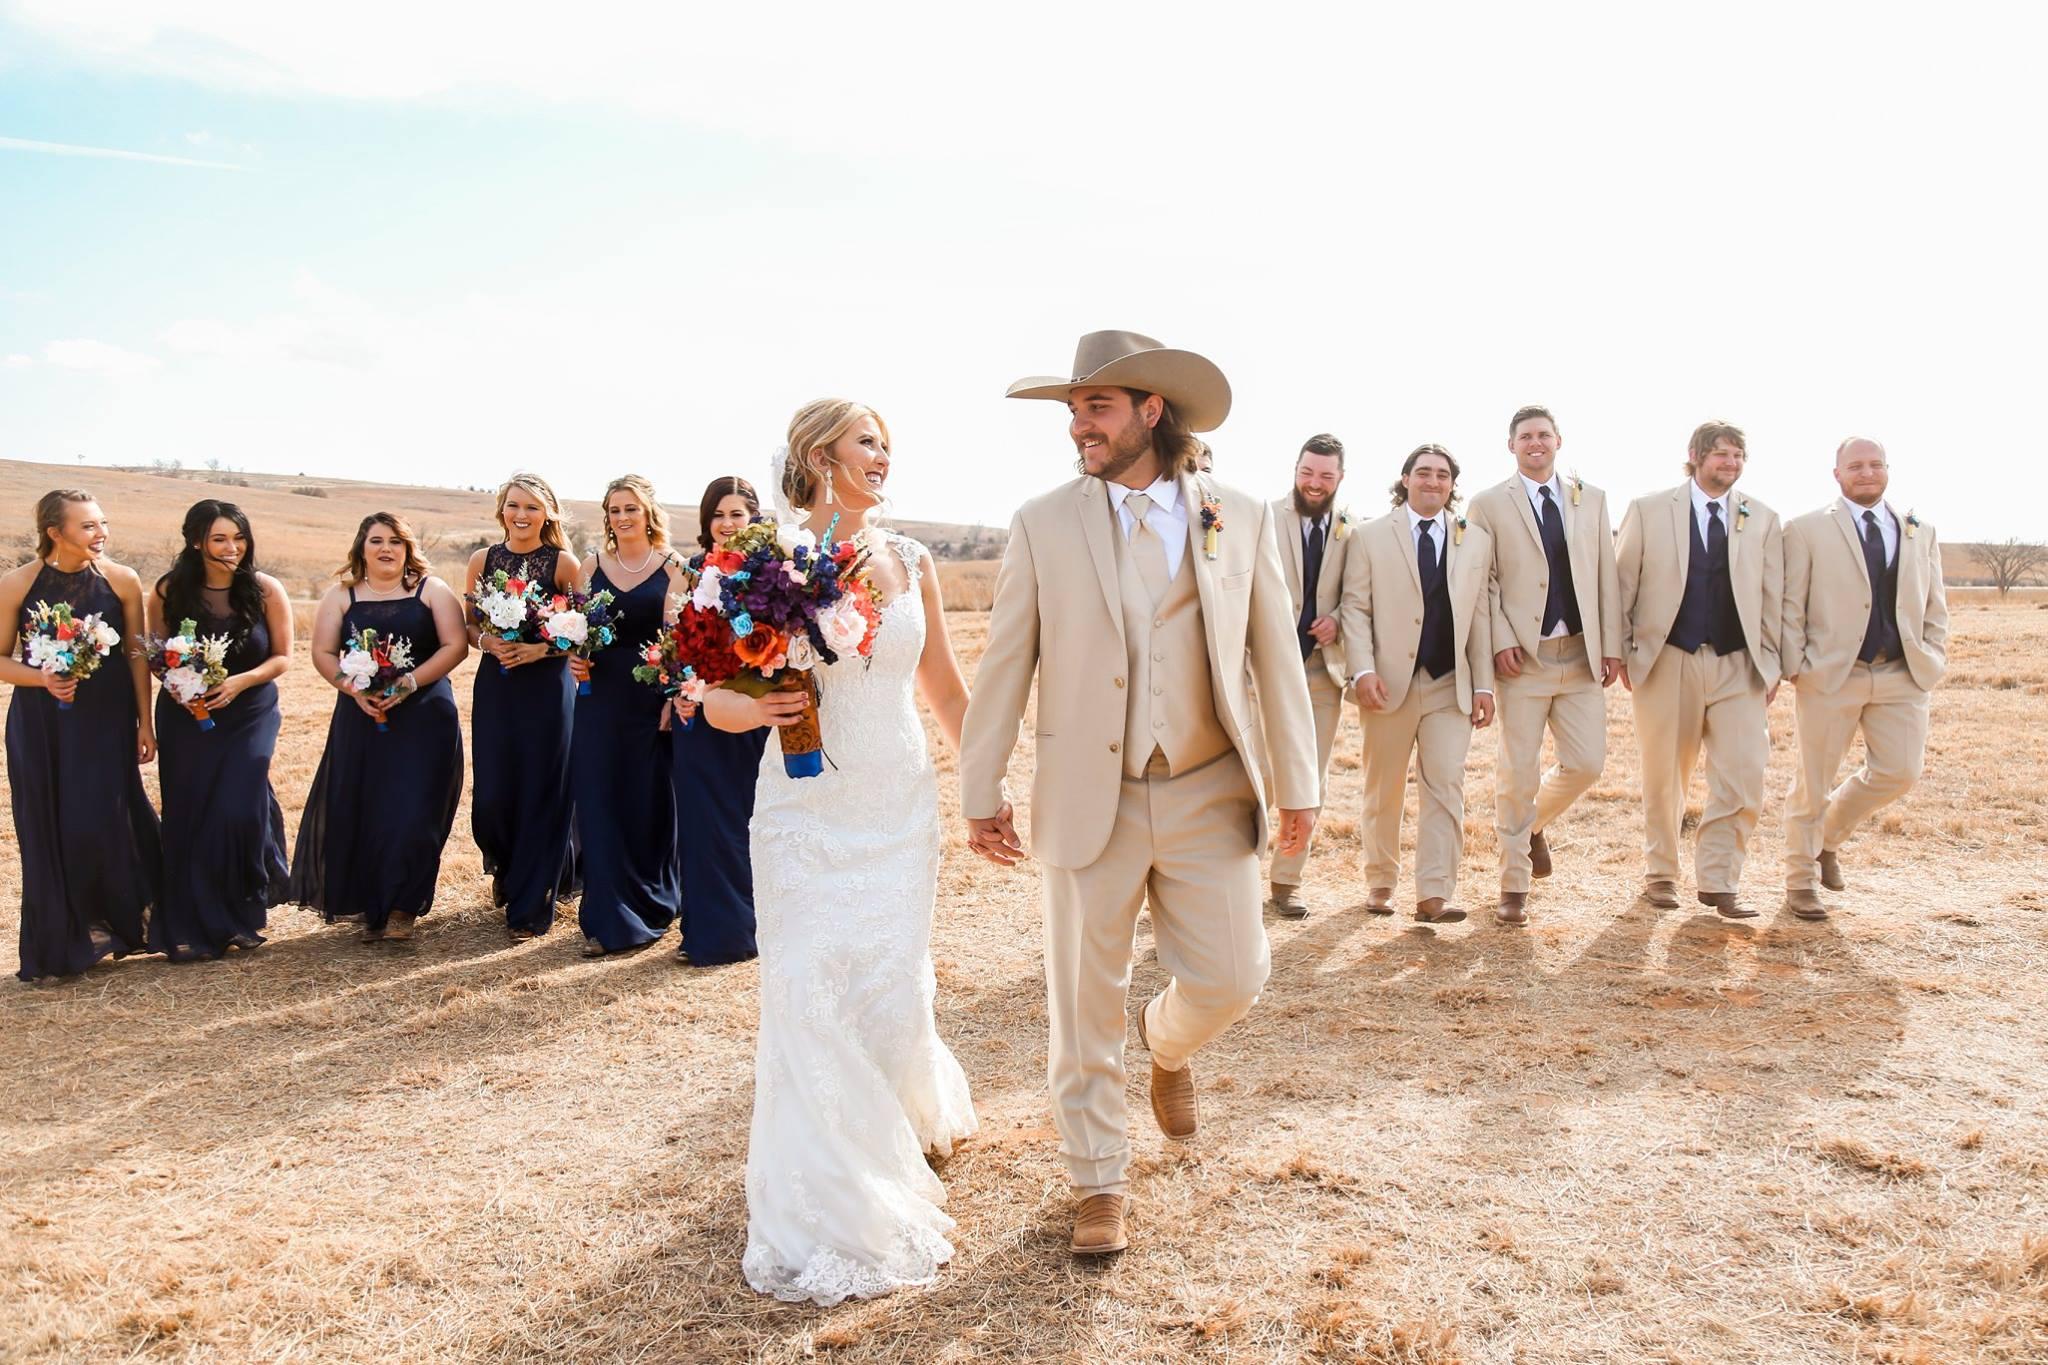 Blair + Corey || Country Wedding